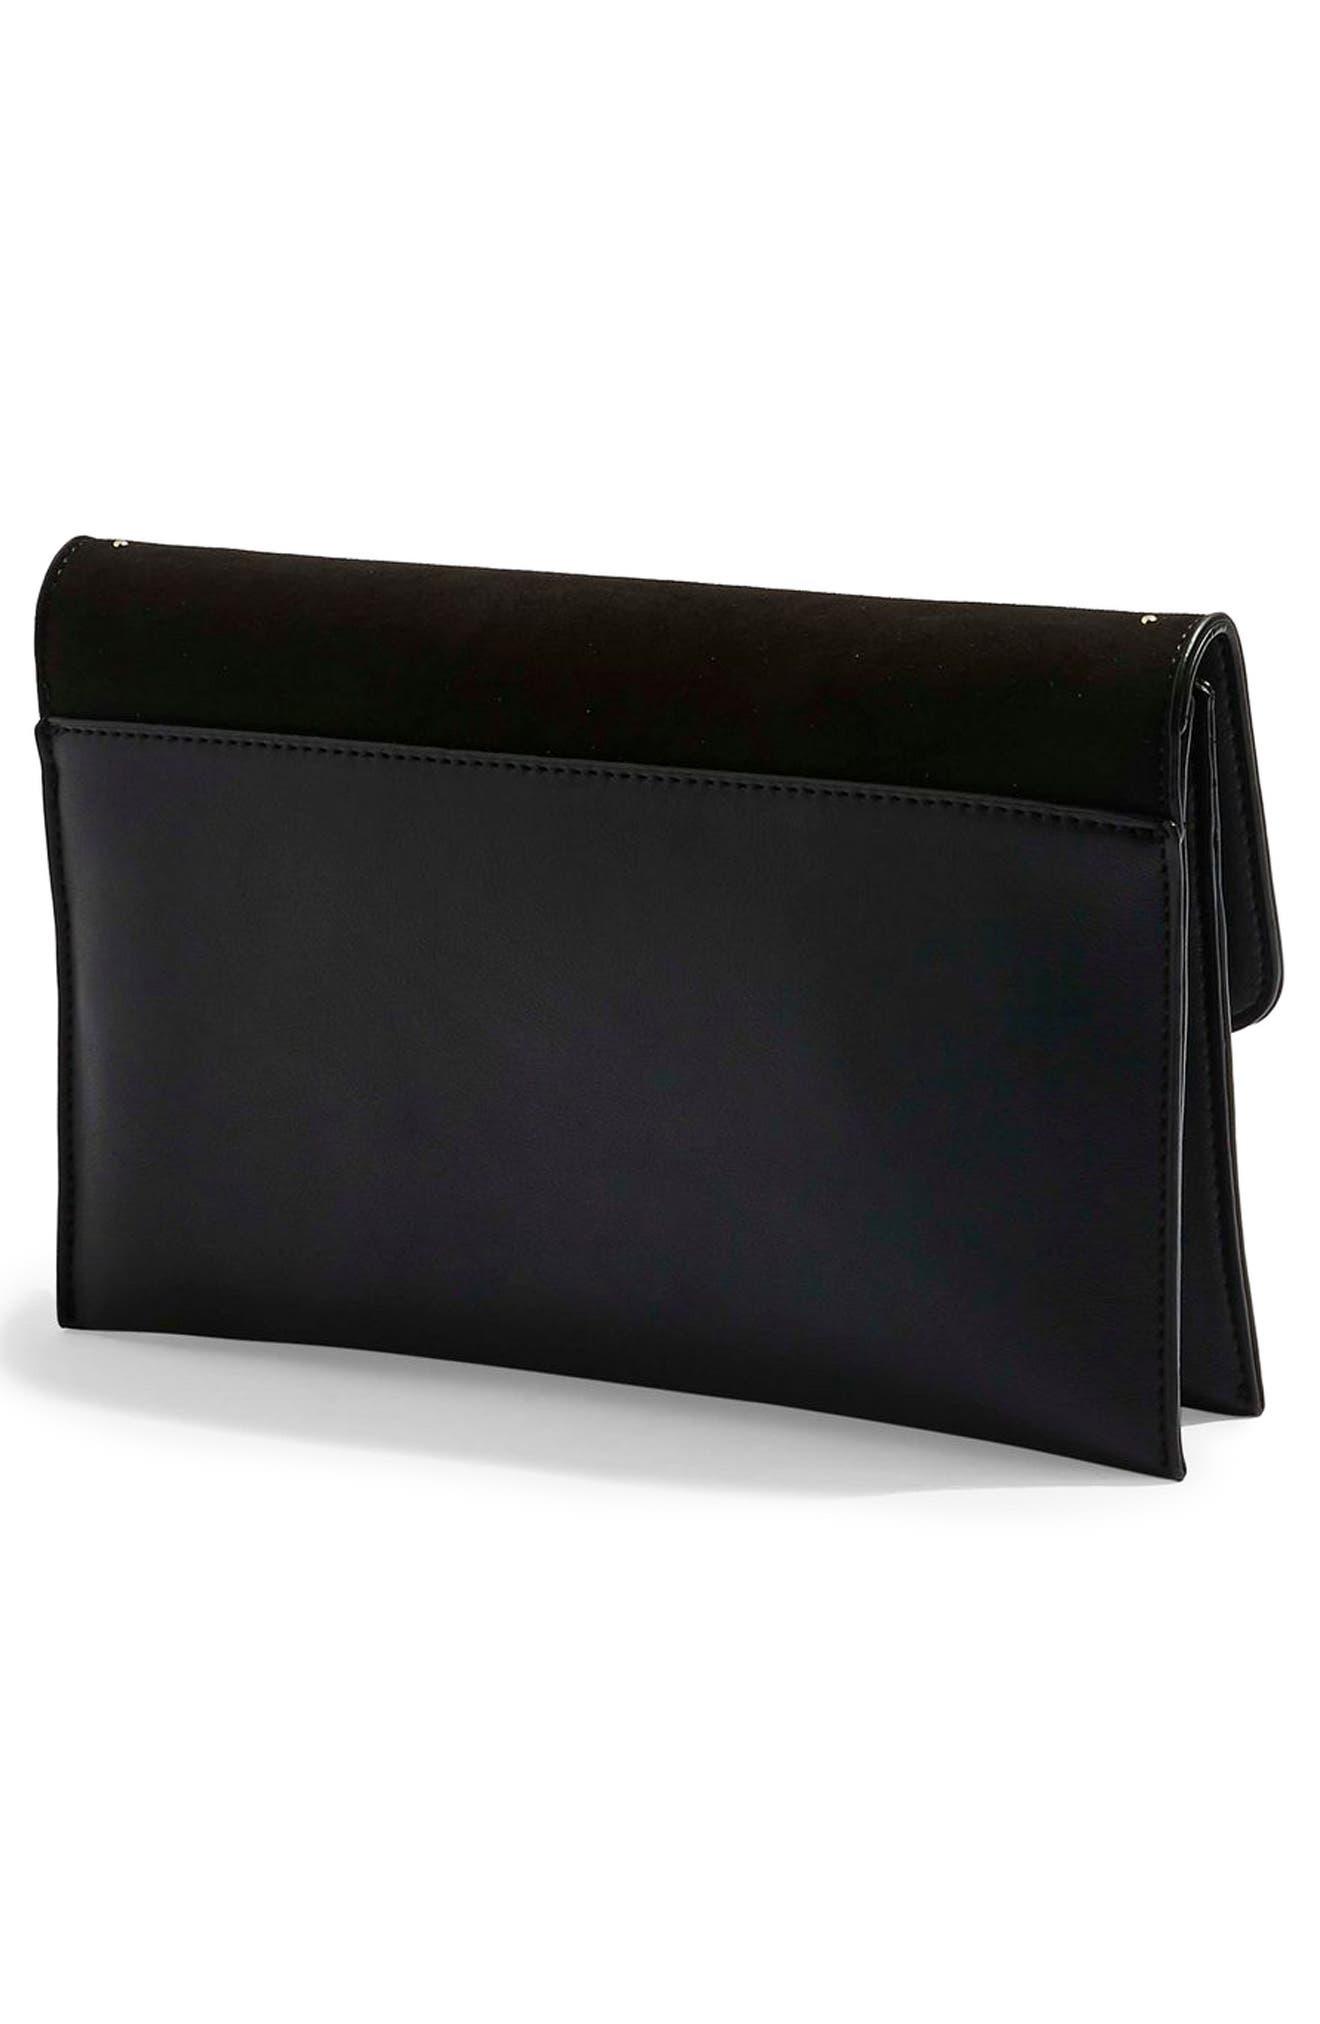 TOPSHOP, Candice Studded Faux Leather Clutch, Alternate thumbnail 4, color, BLACK